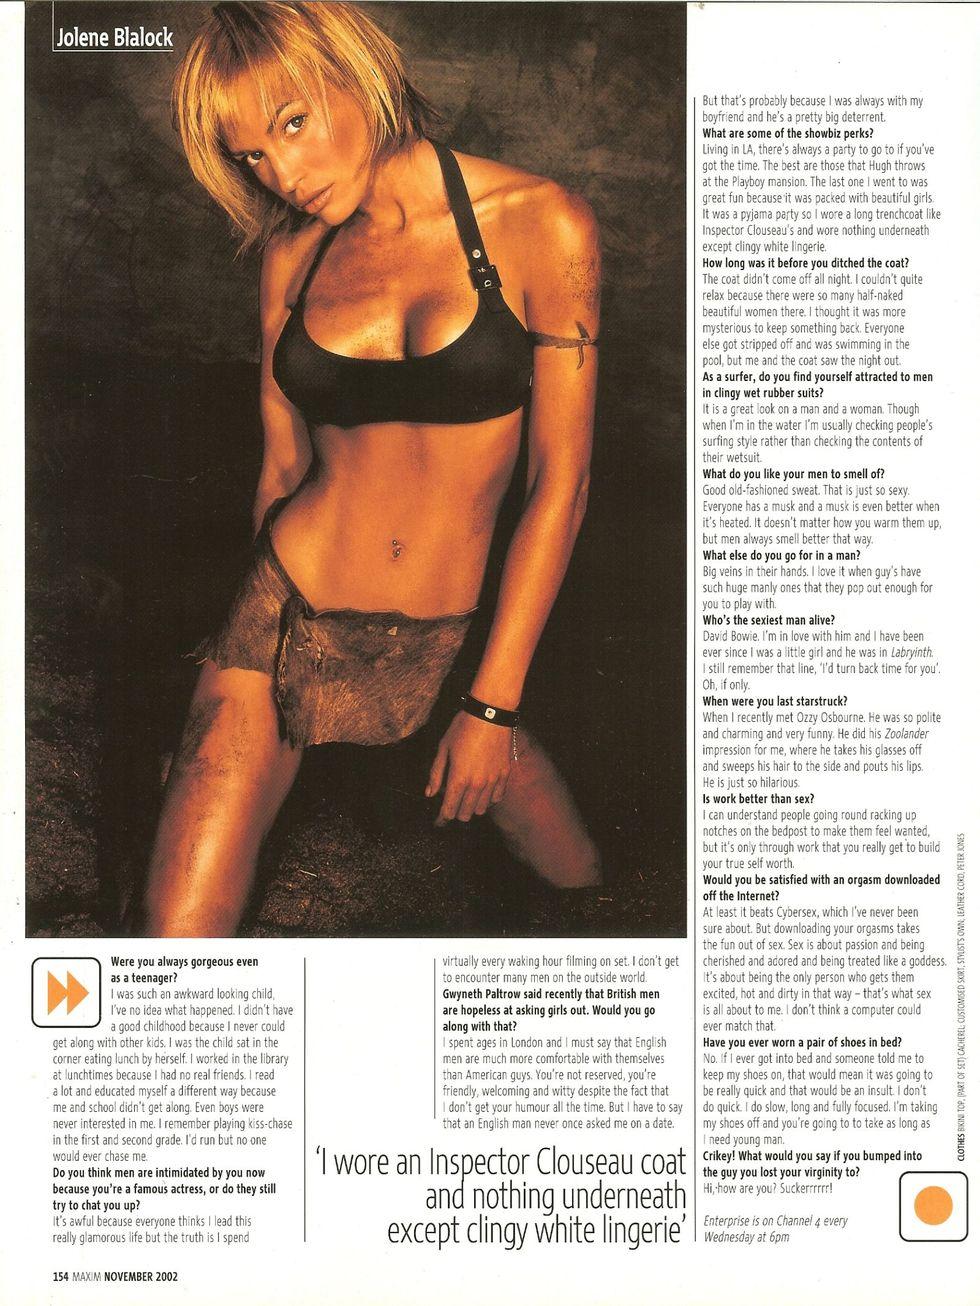 jolene-blalock-maxim-magazine-november-2002-02